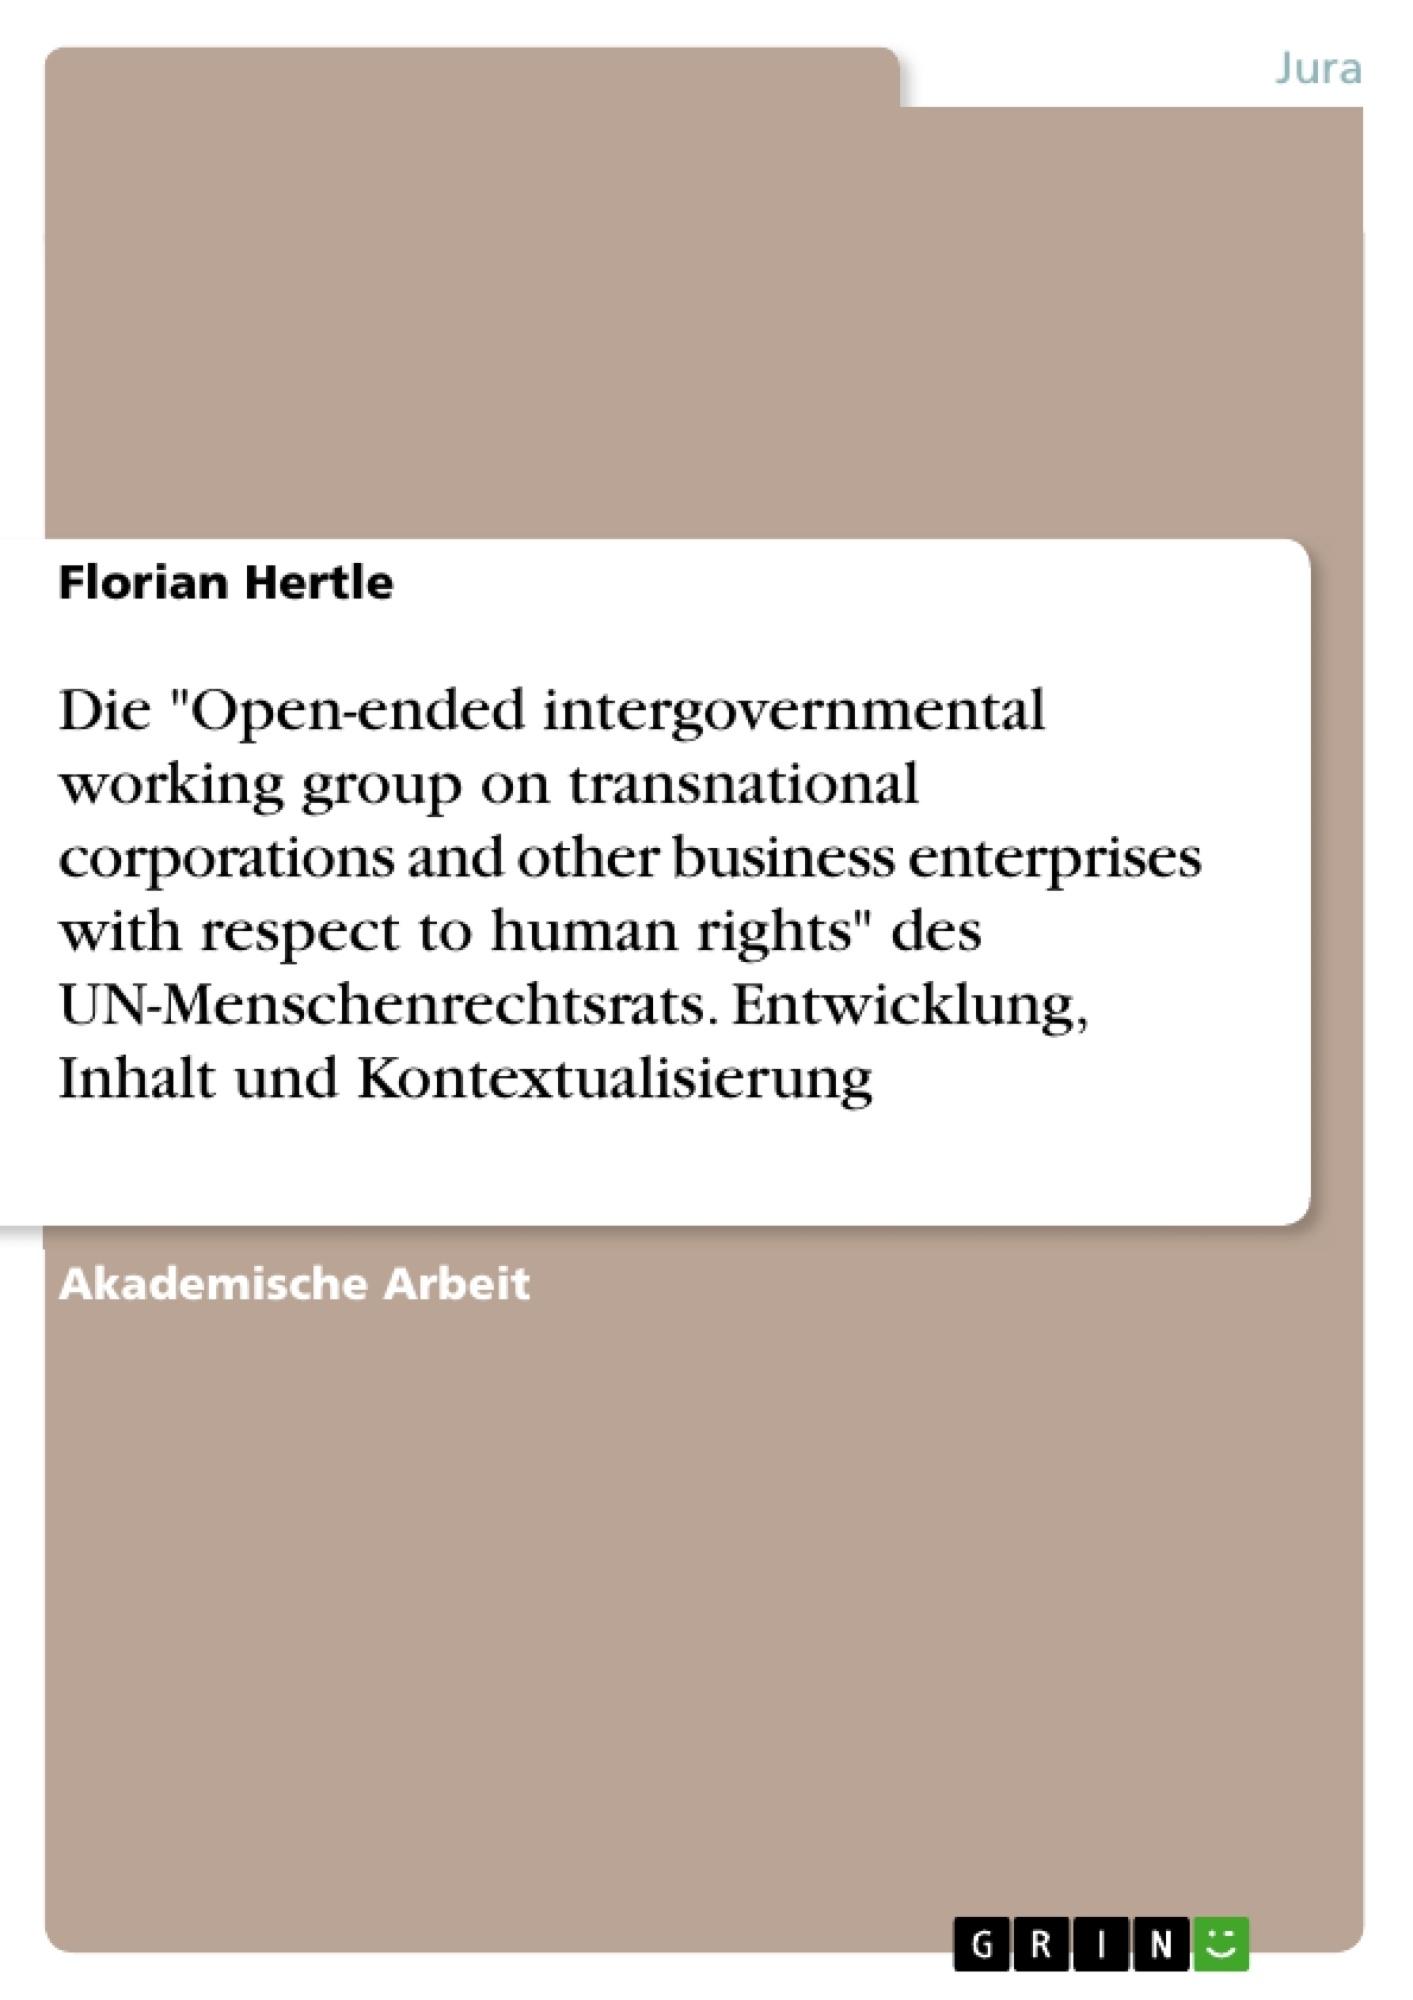 "Titel: Die ""Open-ended intergovernmental working group on transnational corporations and other business enterprises with respect to human rights"" des UN-Menschenrechtsrats. Entwicklung, Inhalt und Kontextualisierung"